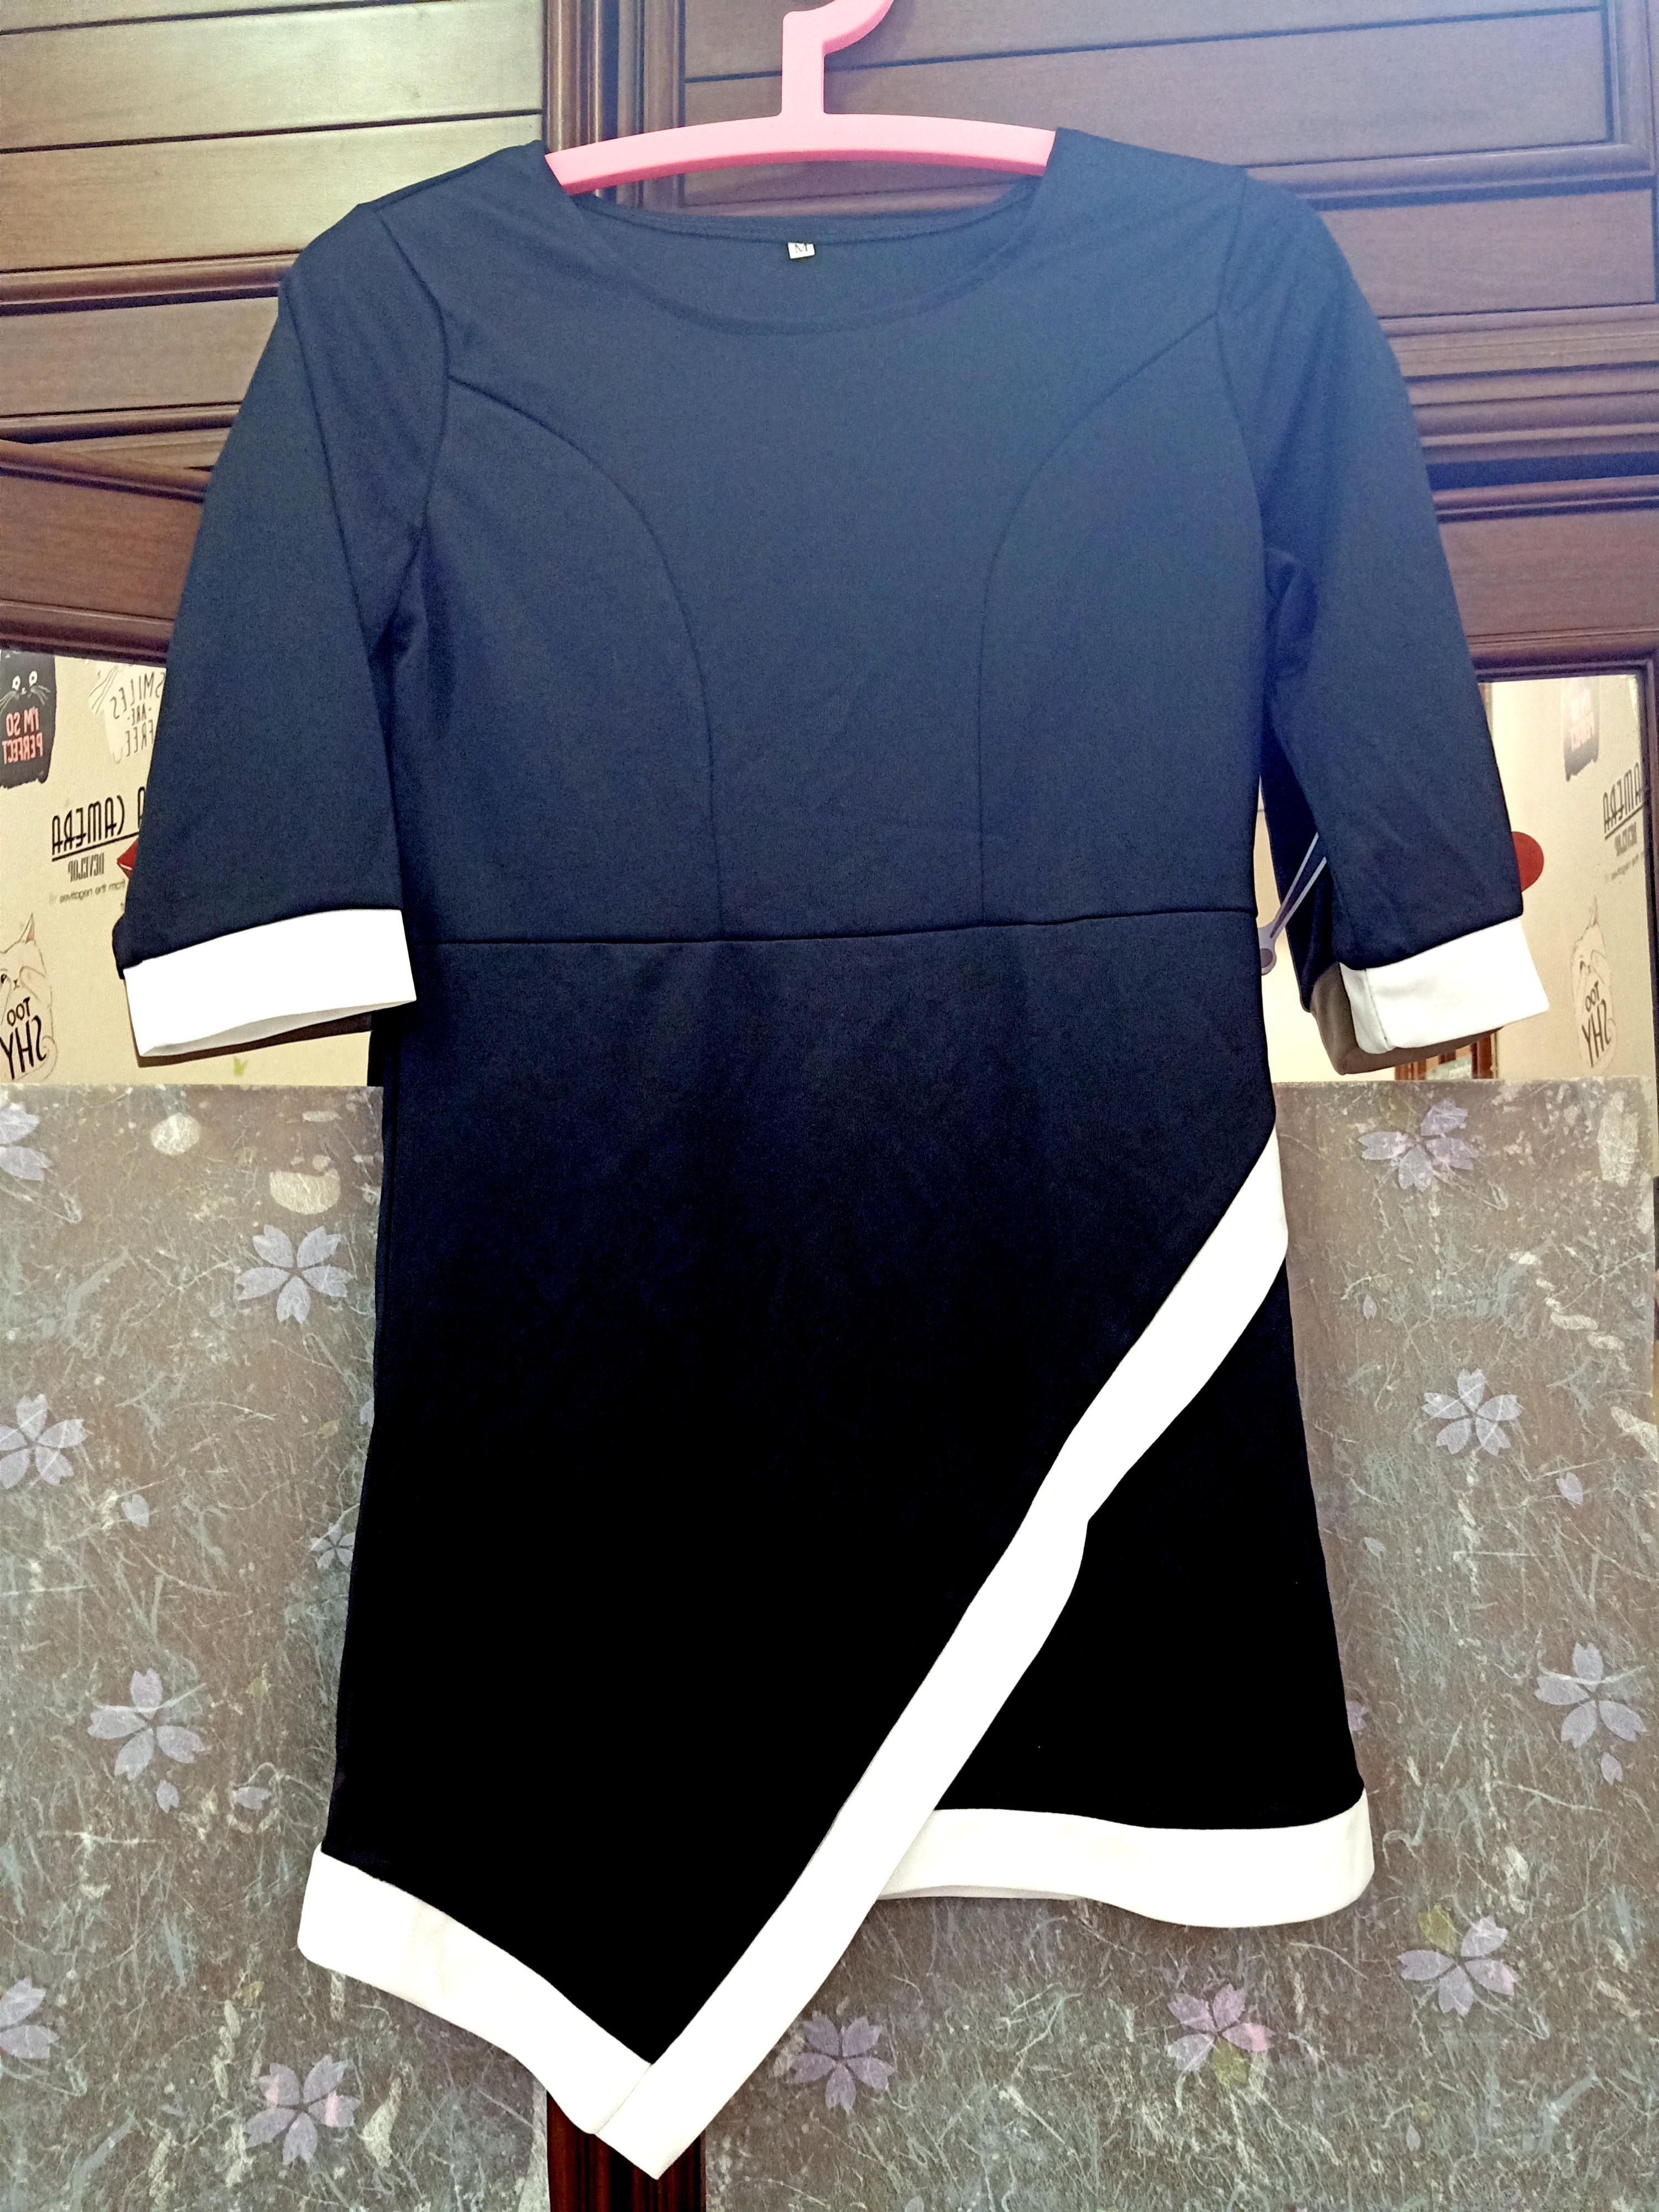 Asymetric Black White Dress (open barter)